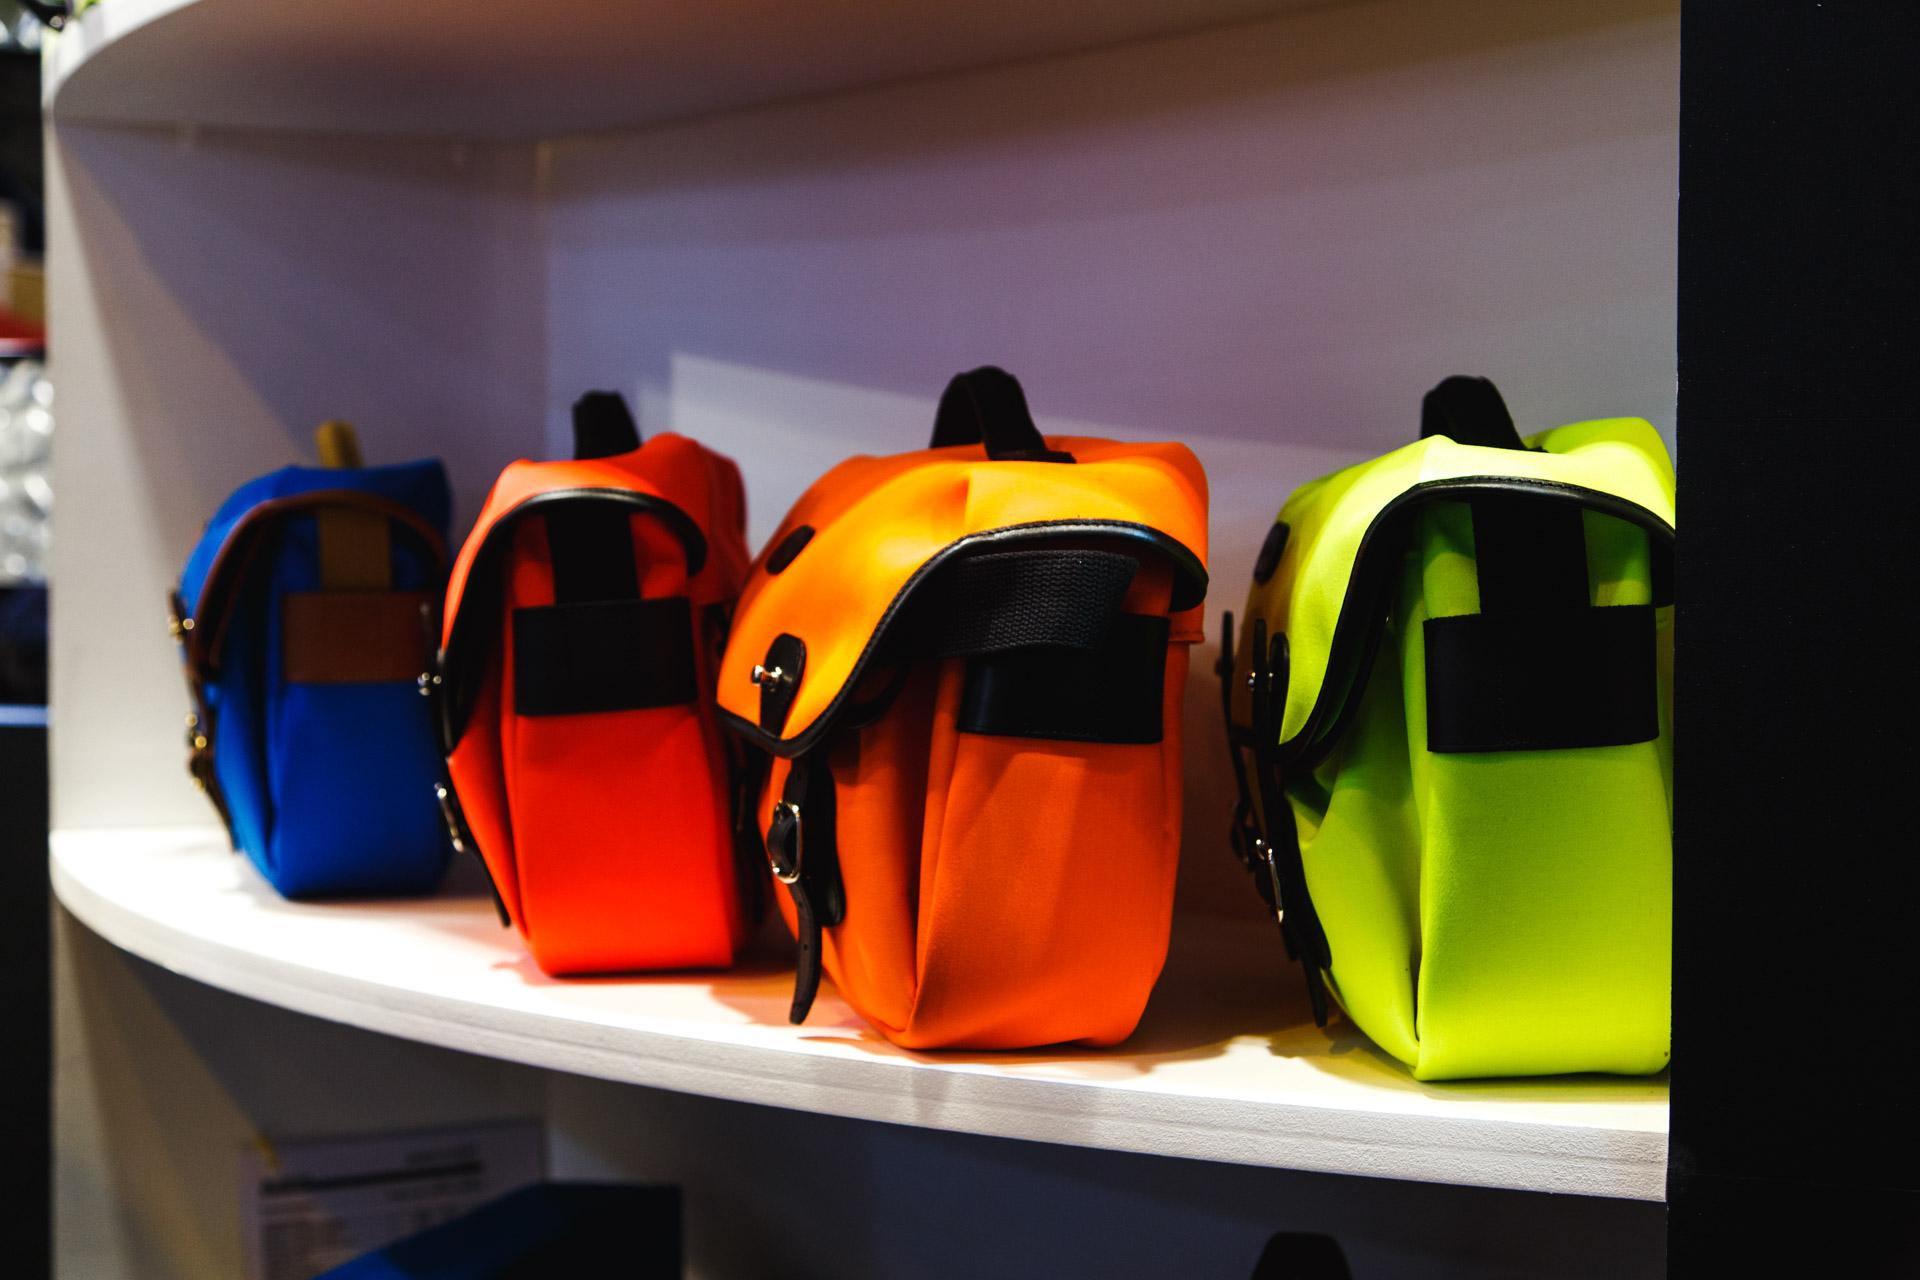 Billingham's colourful camera bags.